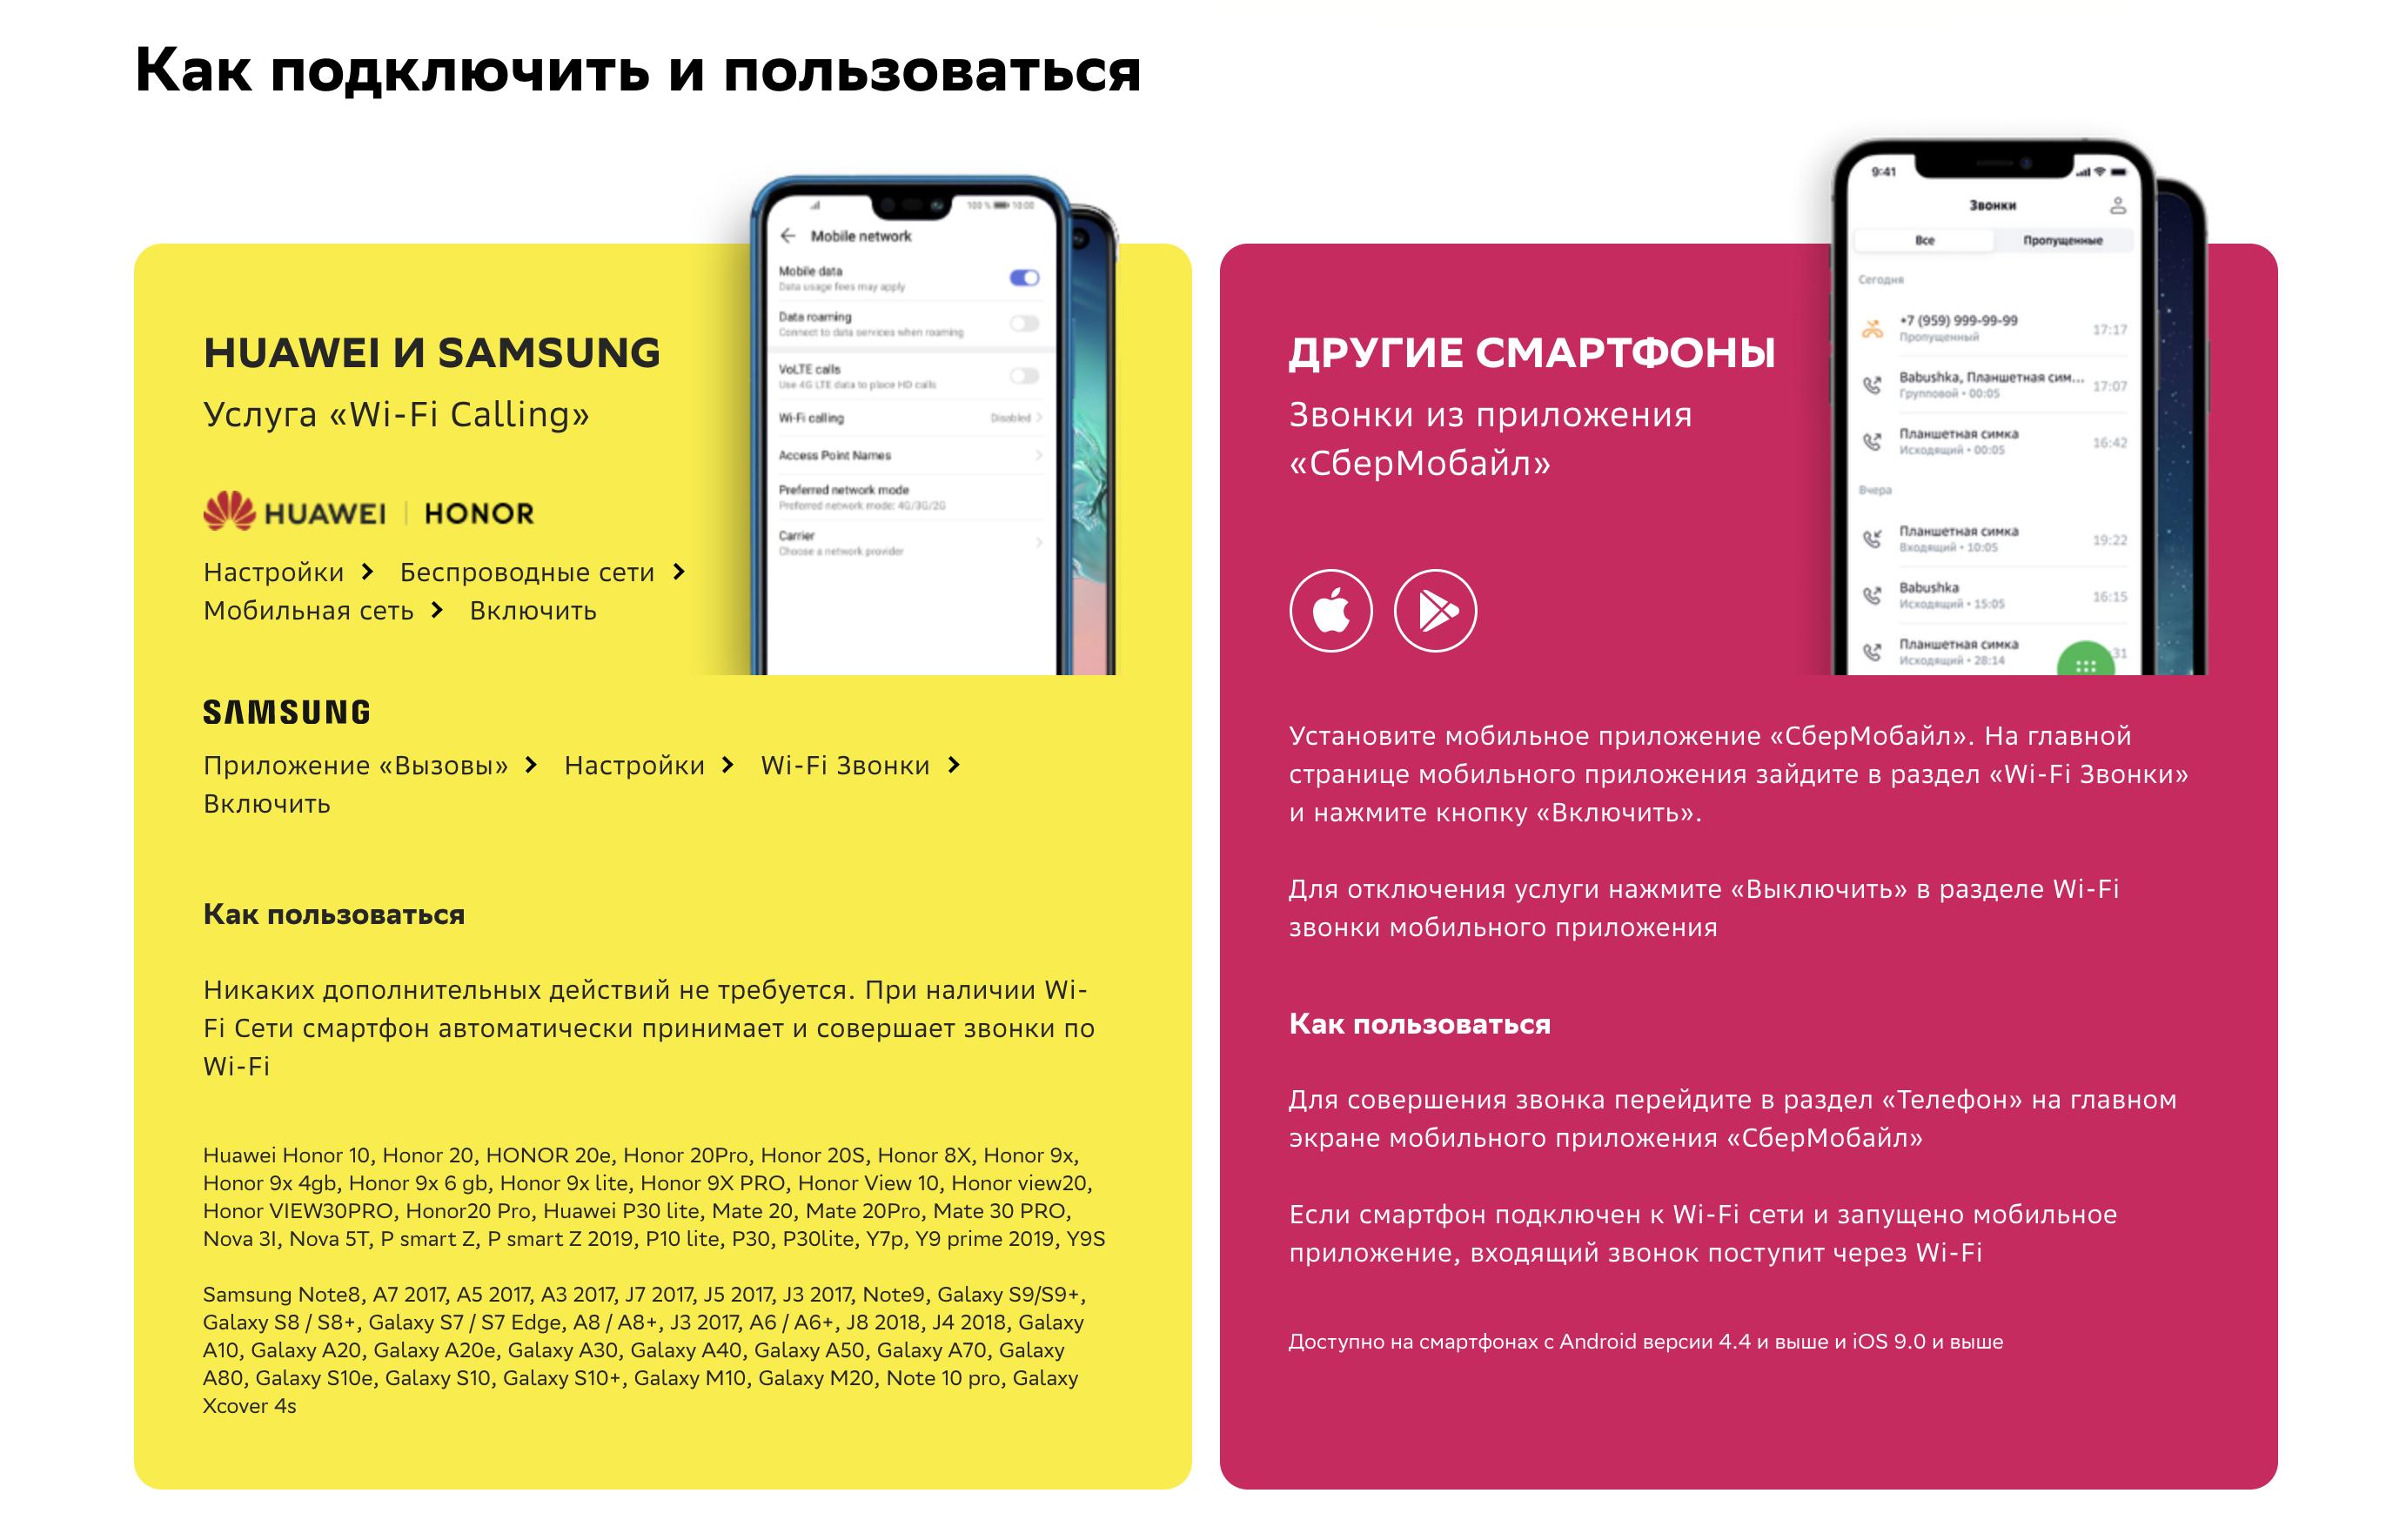 wi-fi звонки сбермобайл как пользоваться